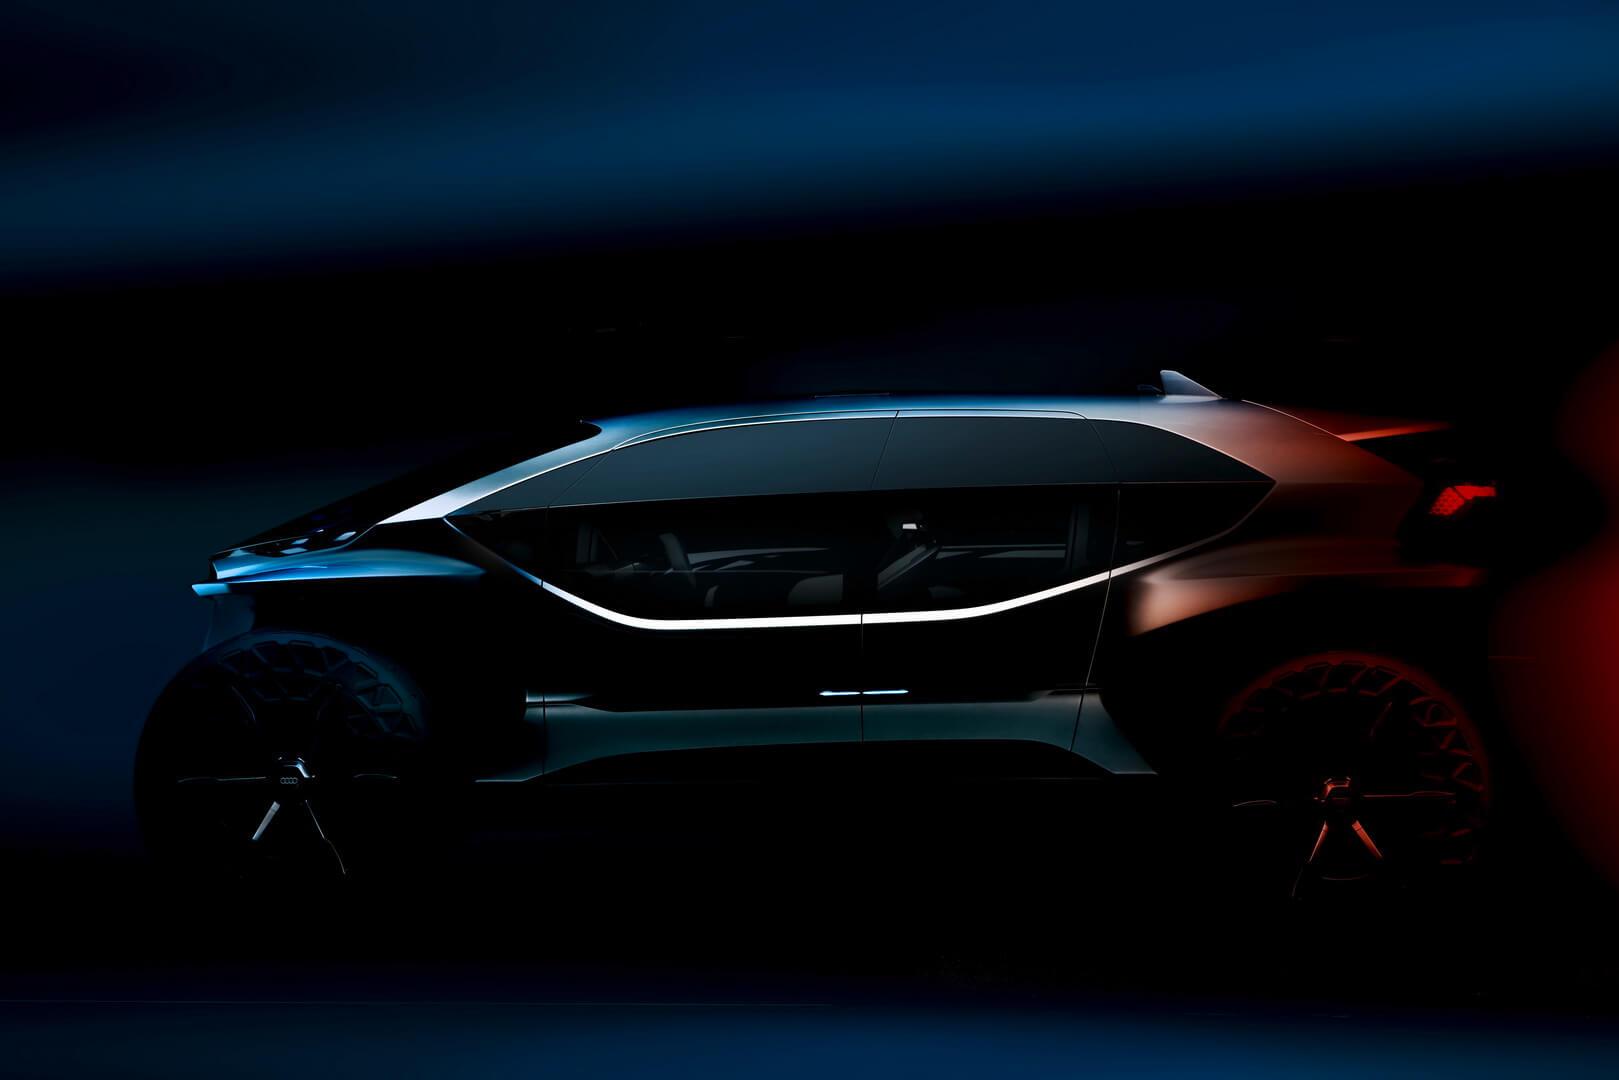 Тизер электрического внедорожника Audi AI:TRAIL quattro